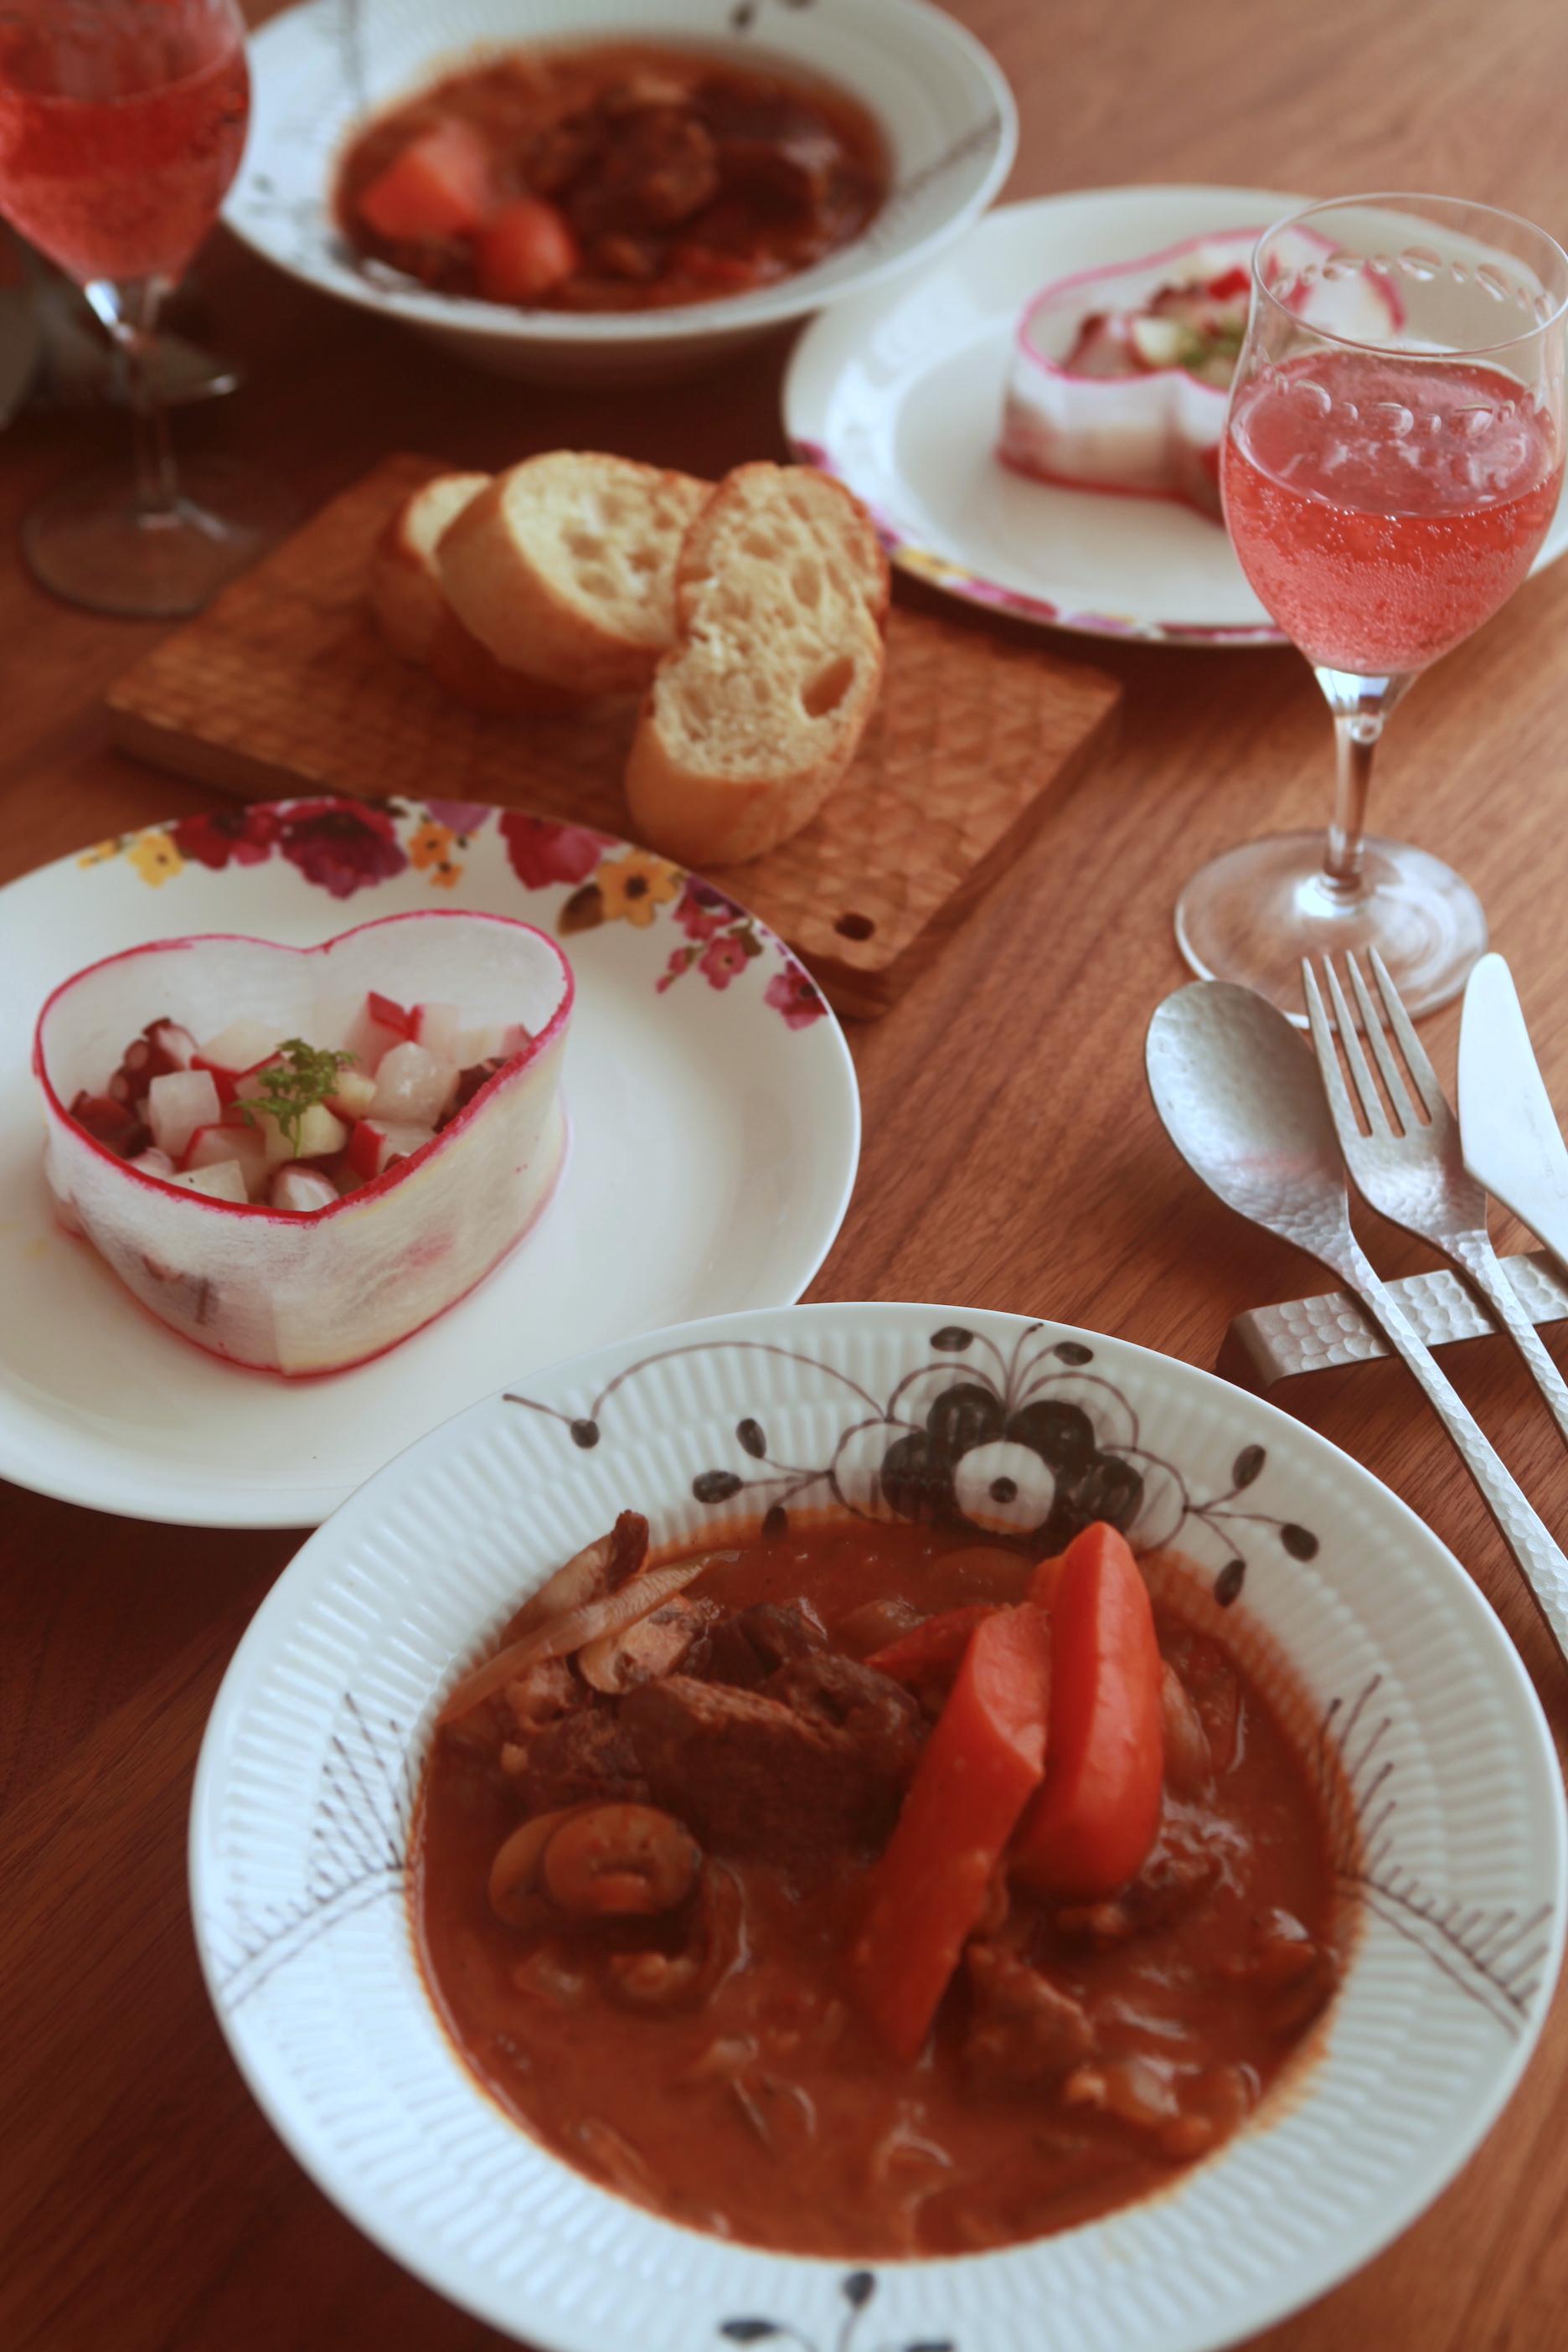 Nadia記事公開!「一緒に作ると愛が深まる♡バレンタインおうちごはん」